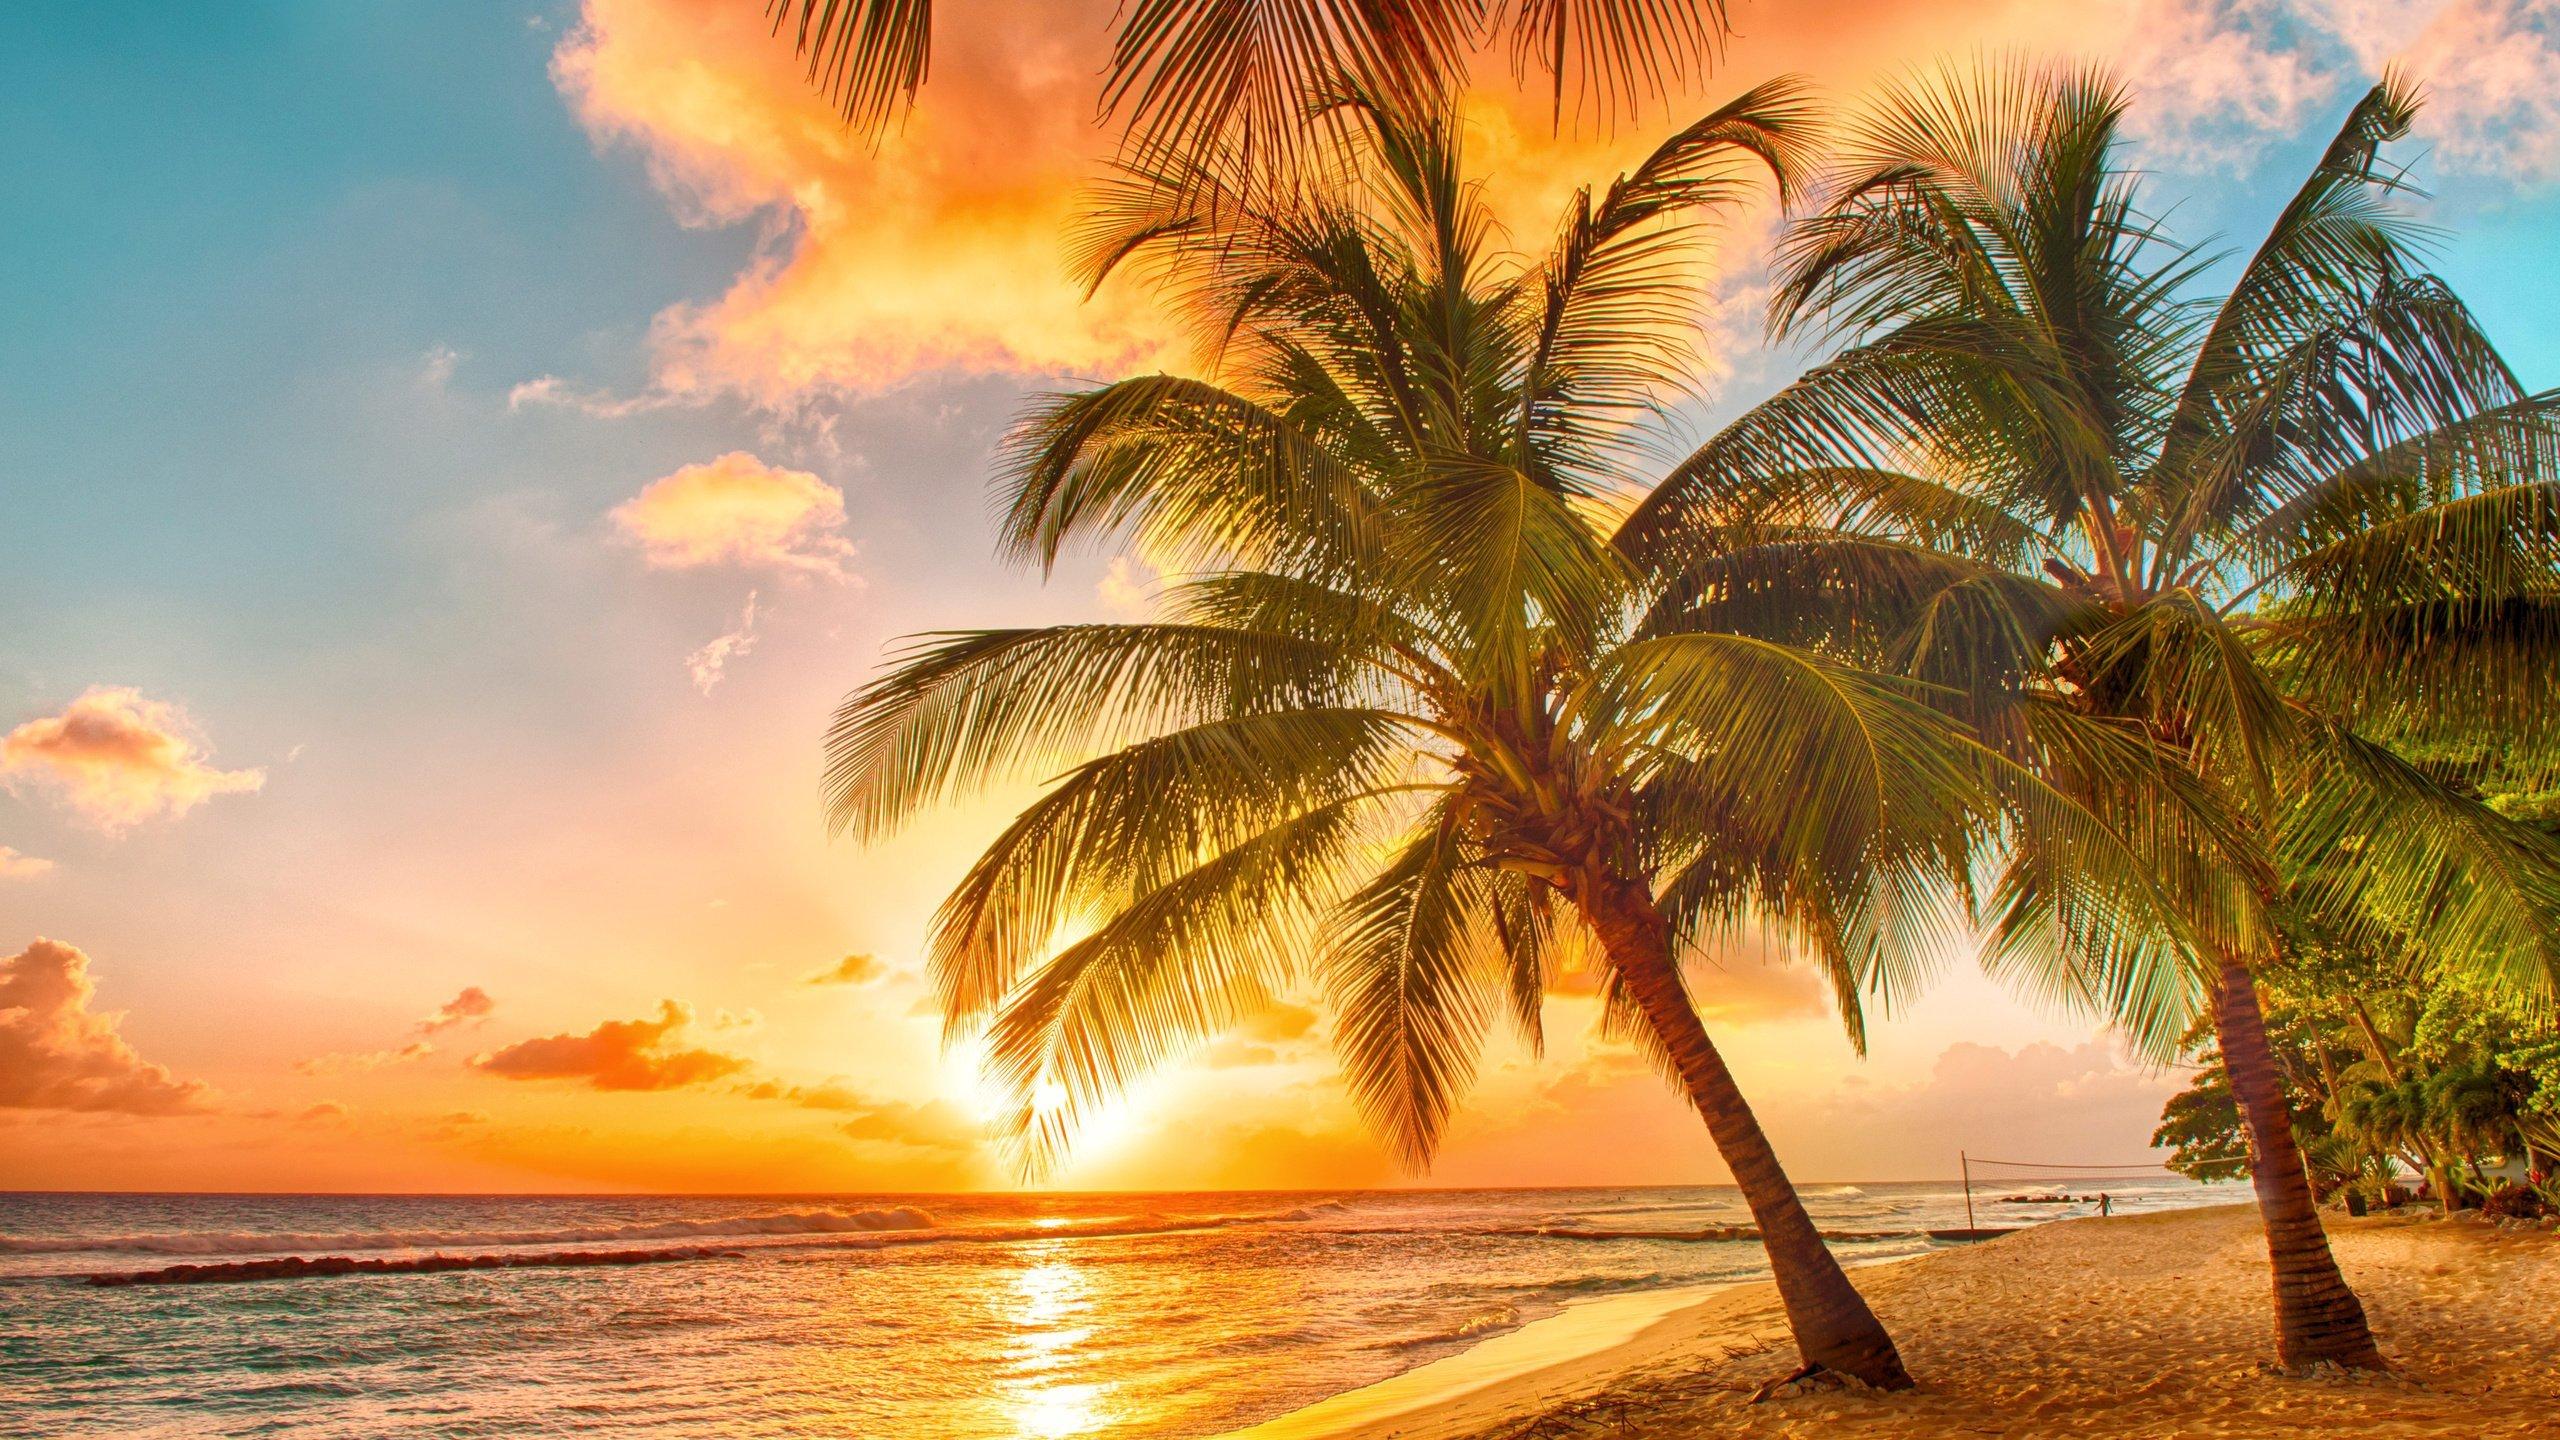 Palm Tree Screensaver a wallpaper